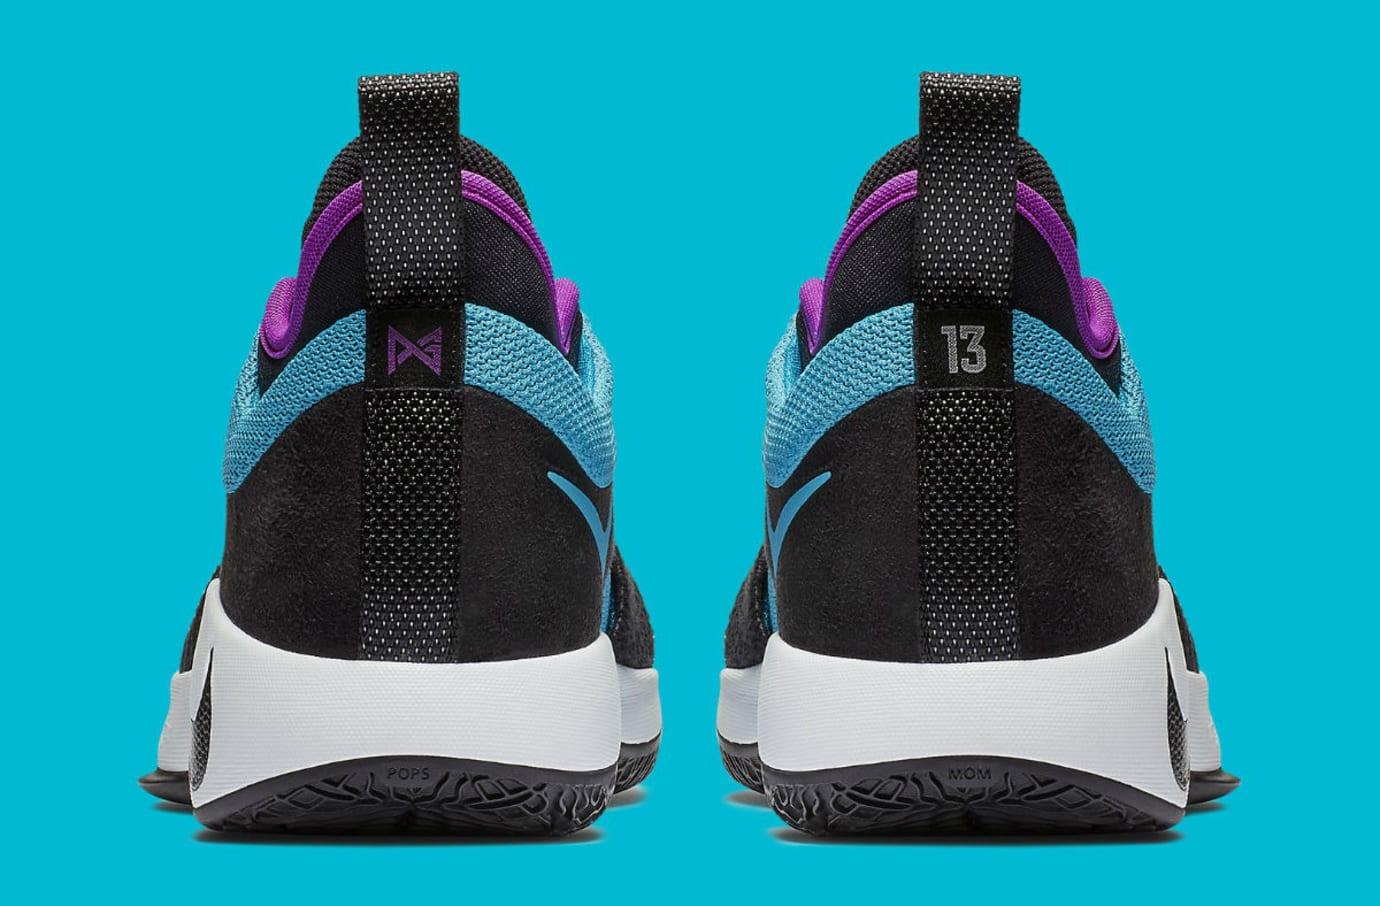 fb506b08a875 Image via Nike Nike PG 2 South Beach Blue Lagoon Release Date AJ2039-402  Heel